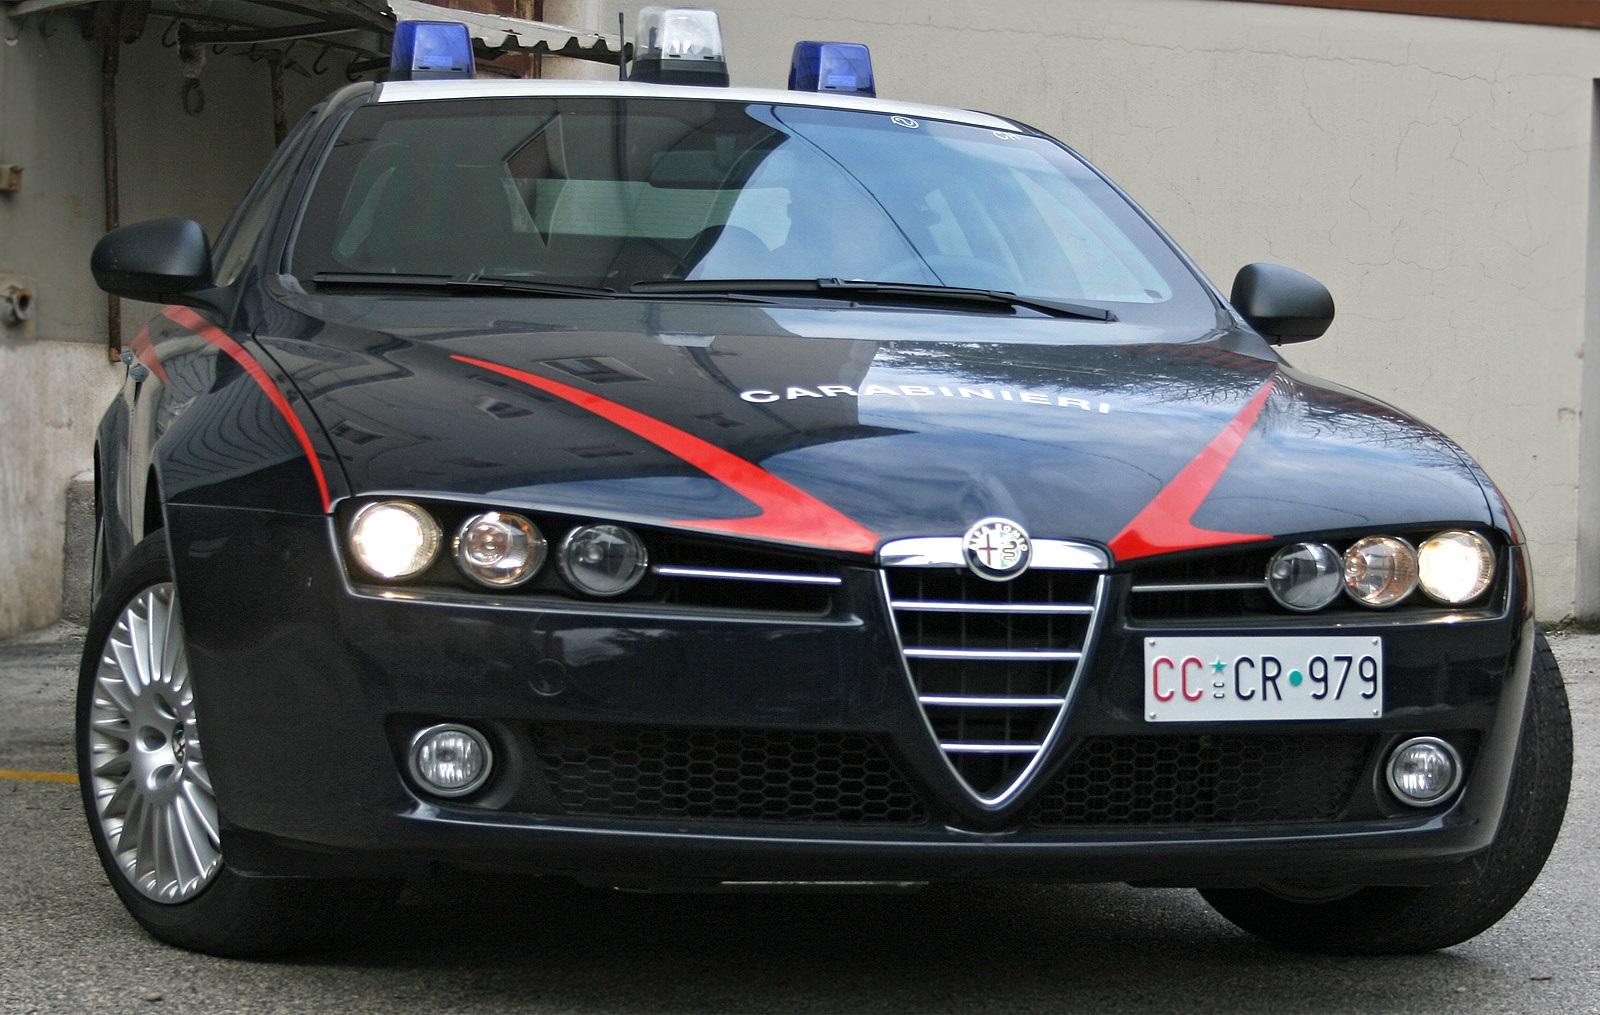 61 camorristi arrestati: blitz in tutta Italia,